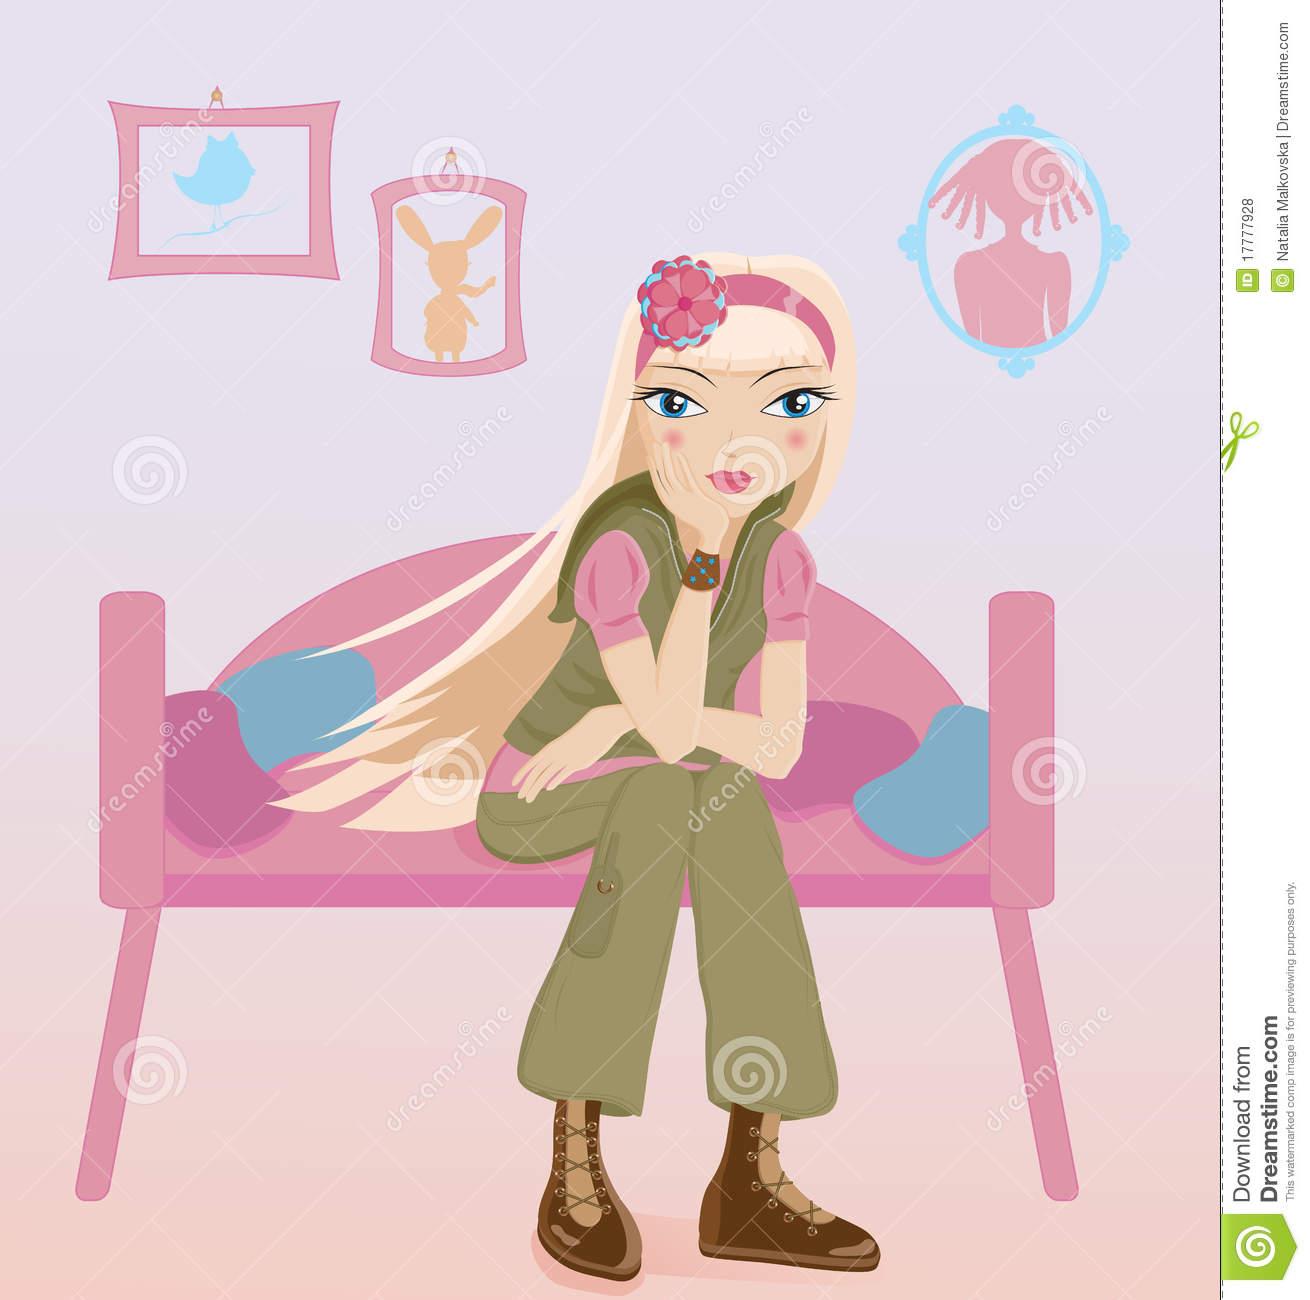 Child Sitting Alone Thinking Stock Illustrations.